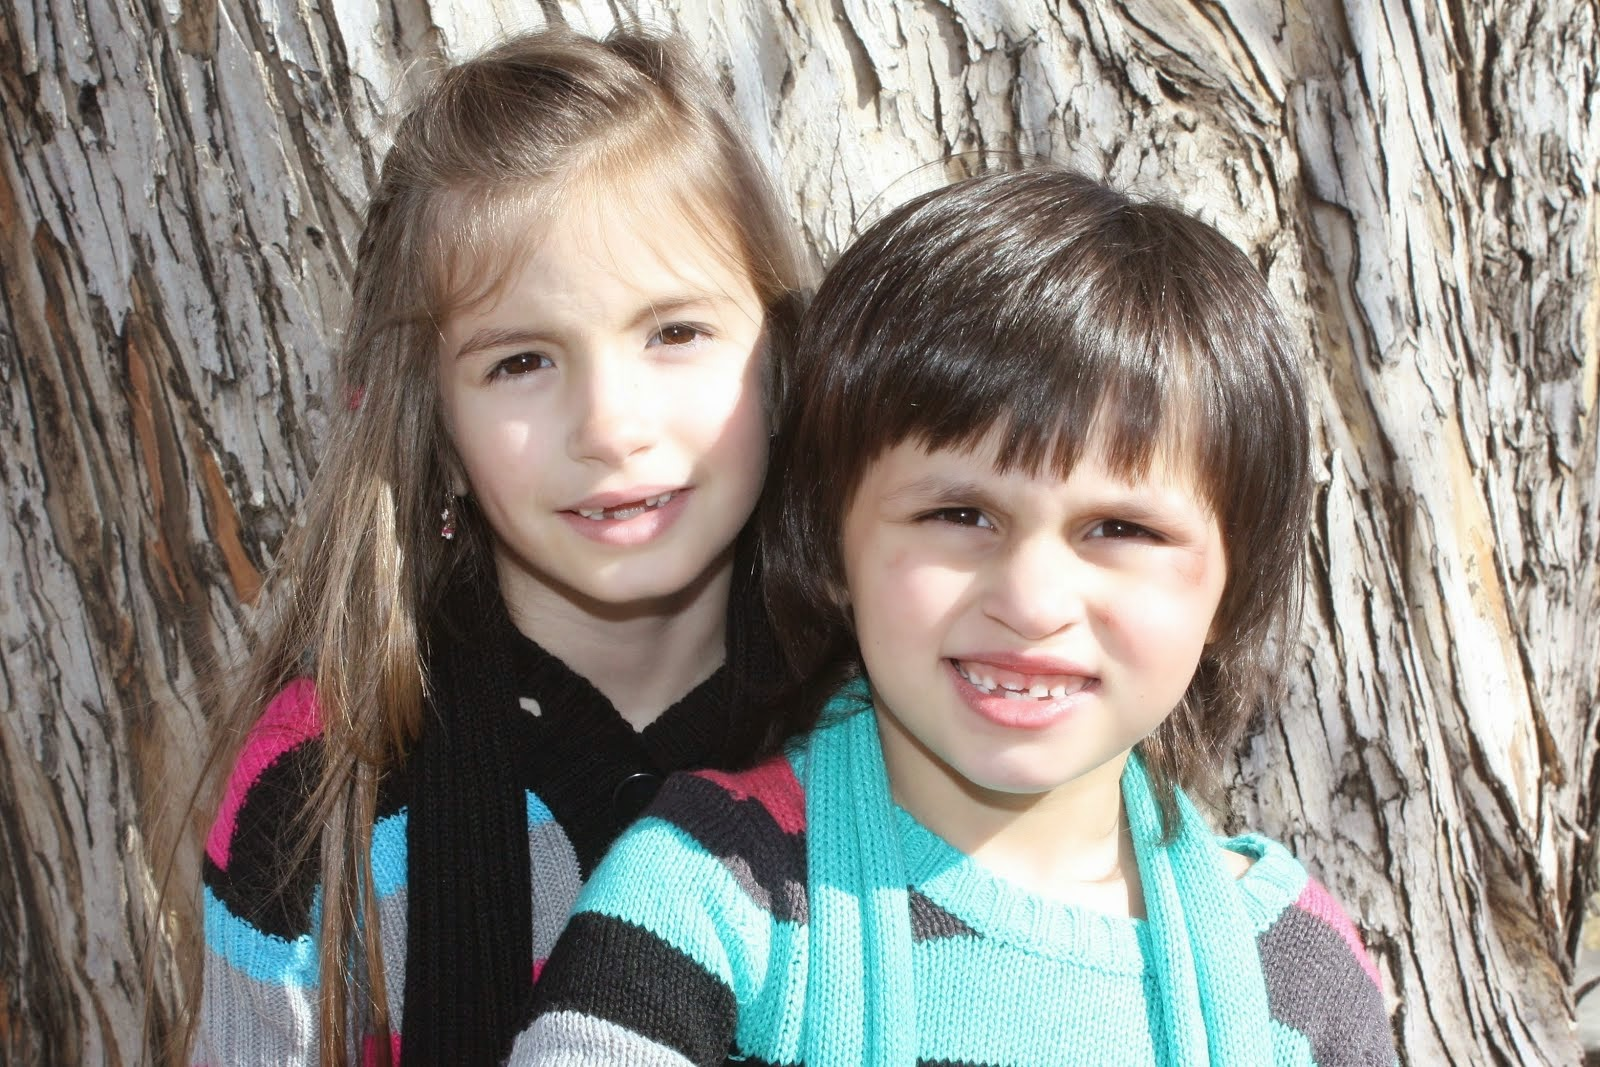 Amber and Eliyanah